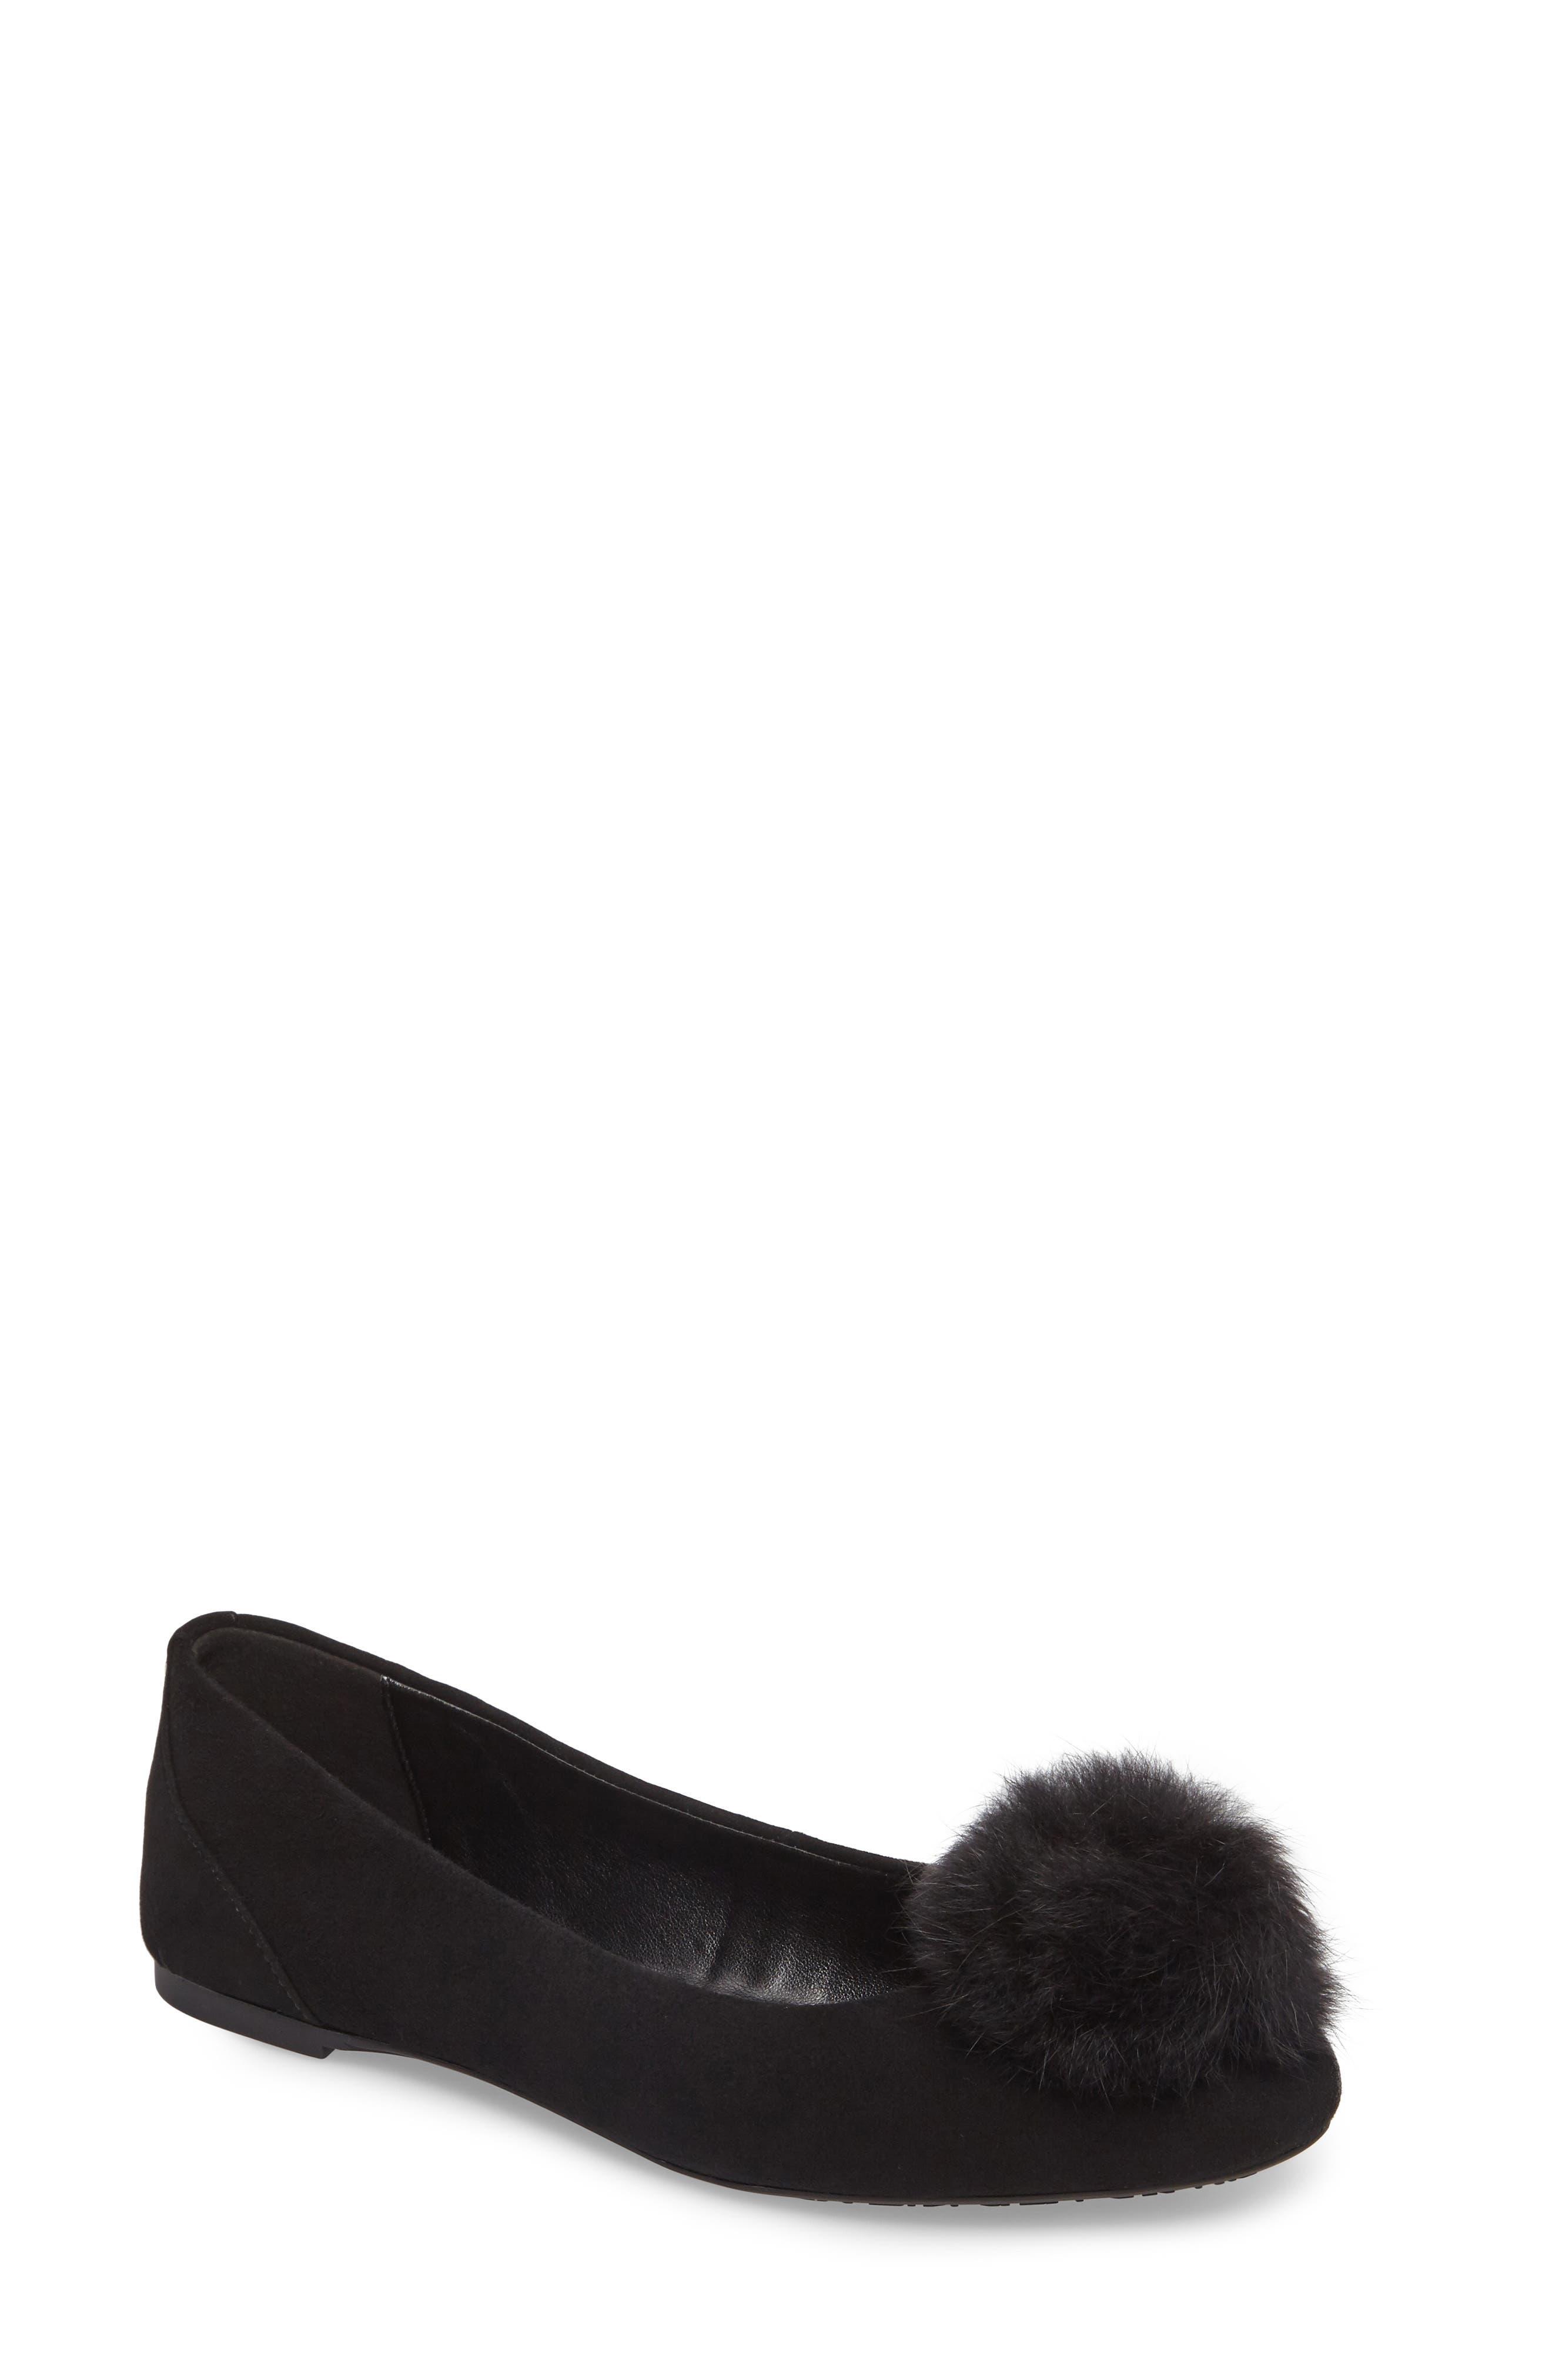 Remi Ballet Flat with Genuine Rabbit Fur Pom,                         Main,                         color, Black Suede